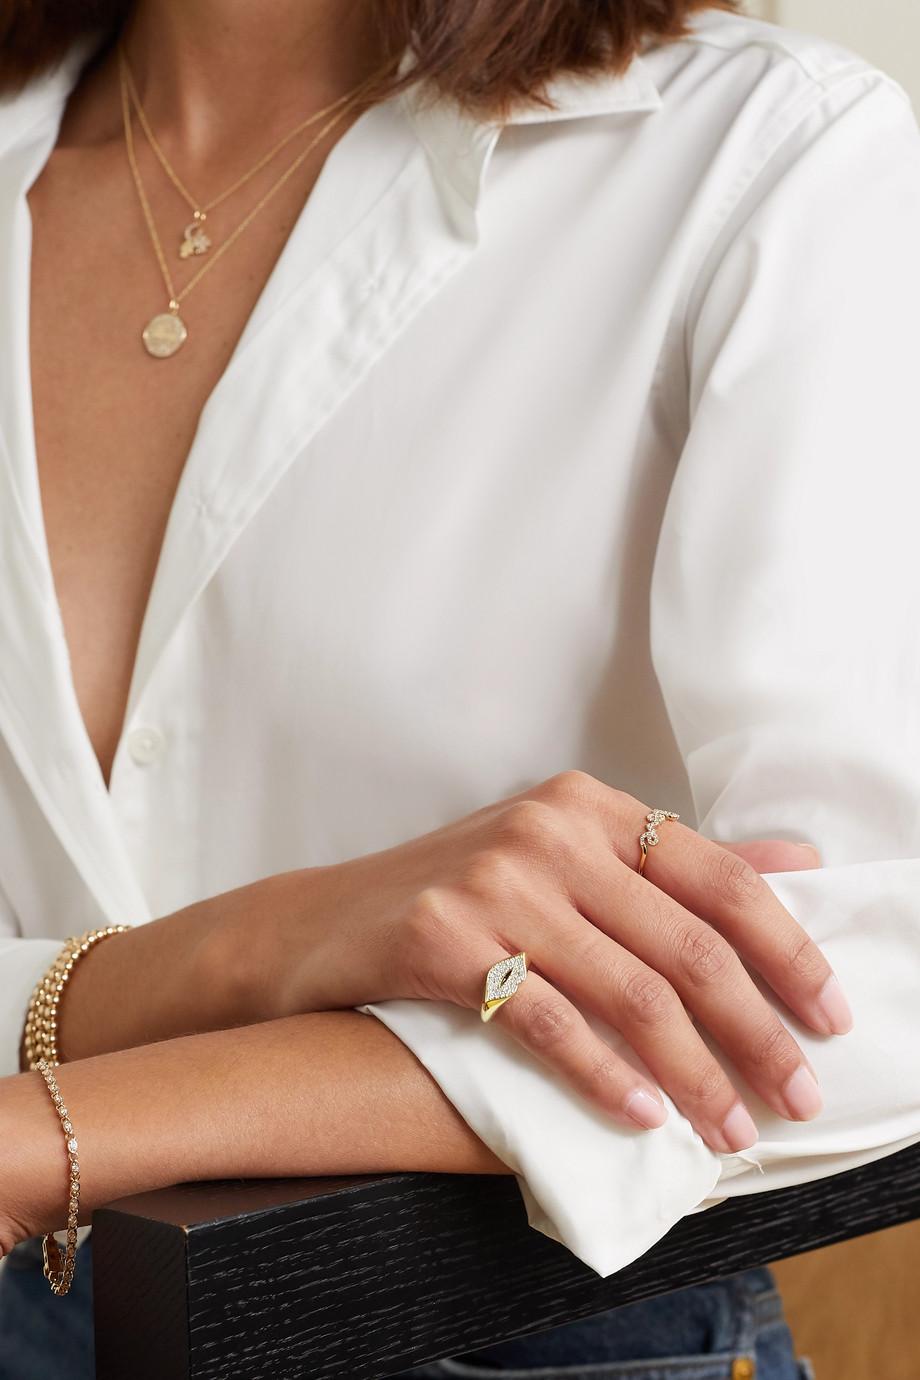 Sydney Evan Lips 14-karat gold diamond ring